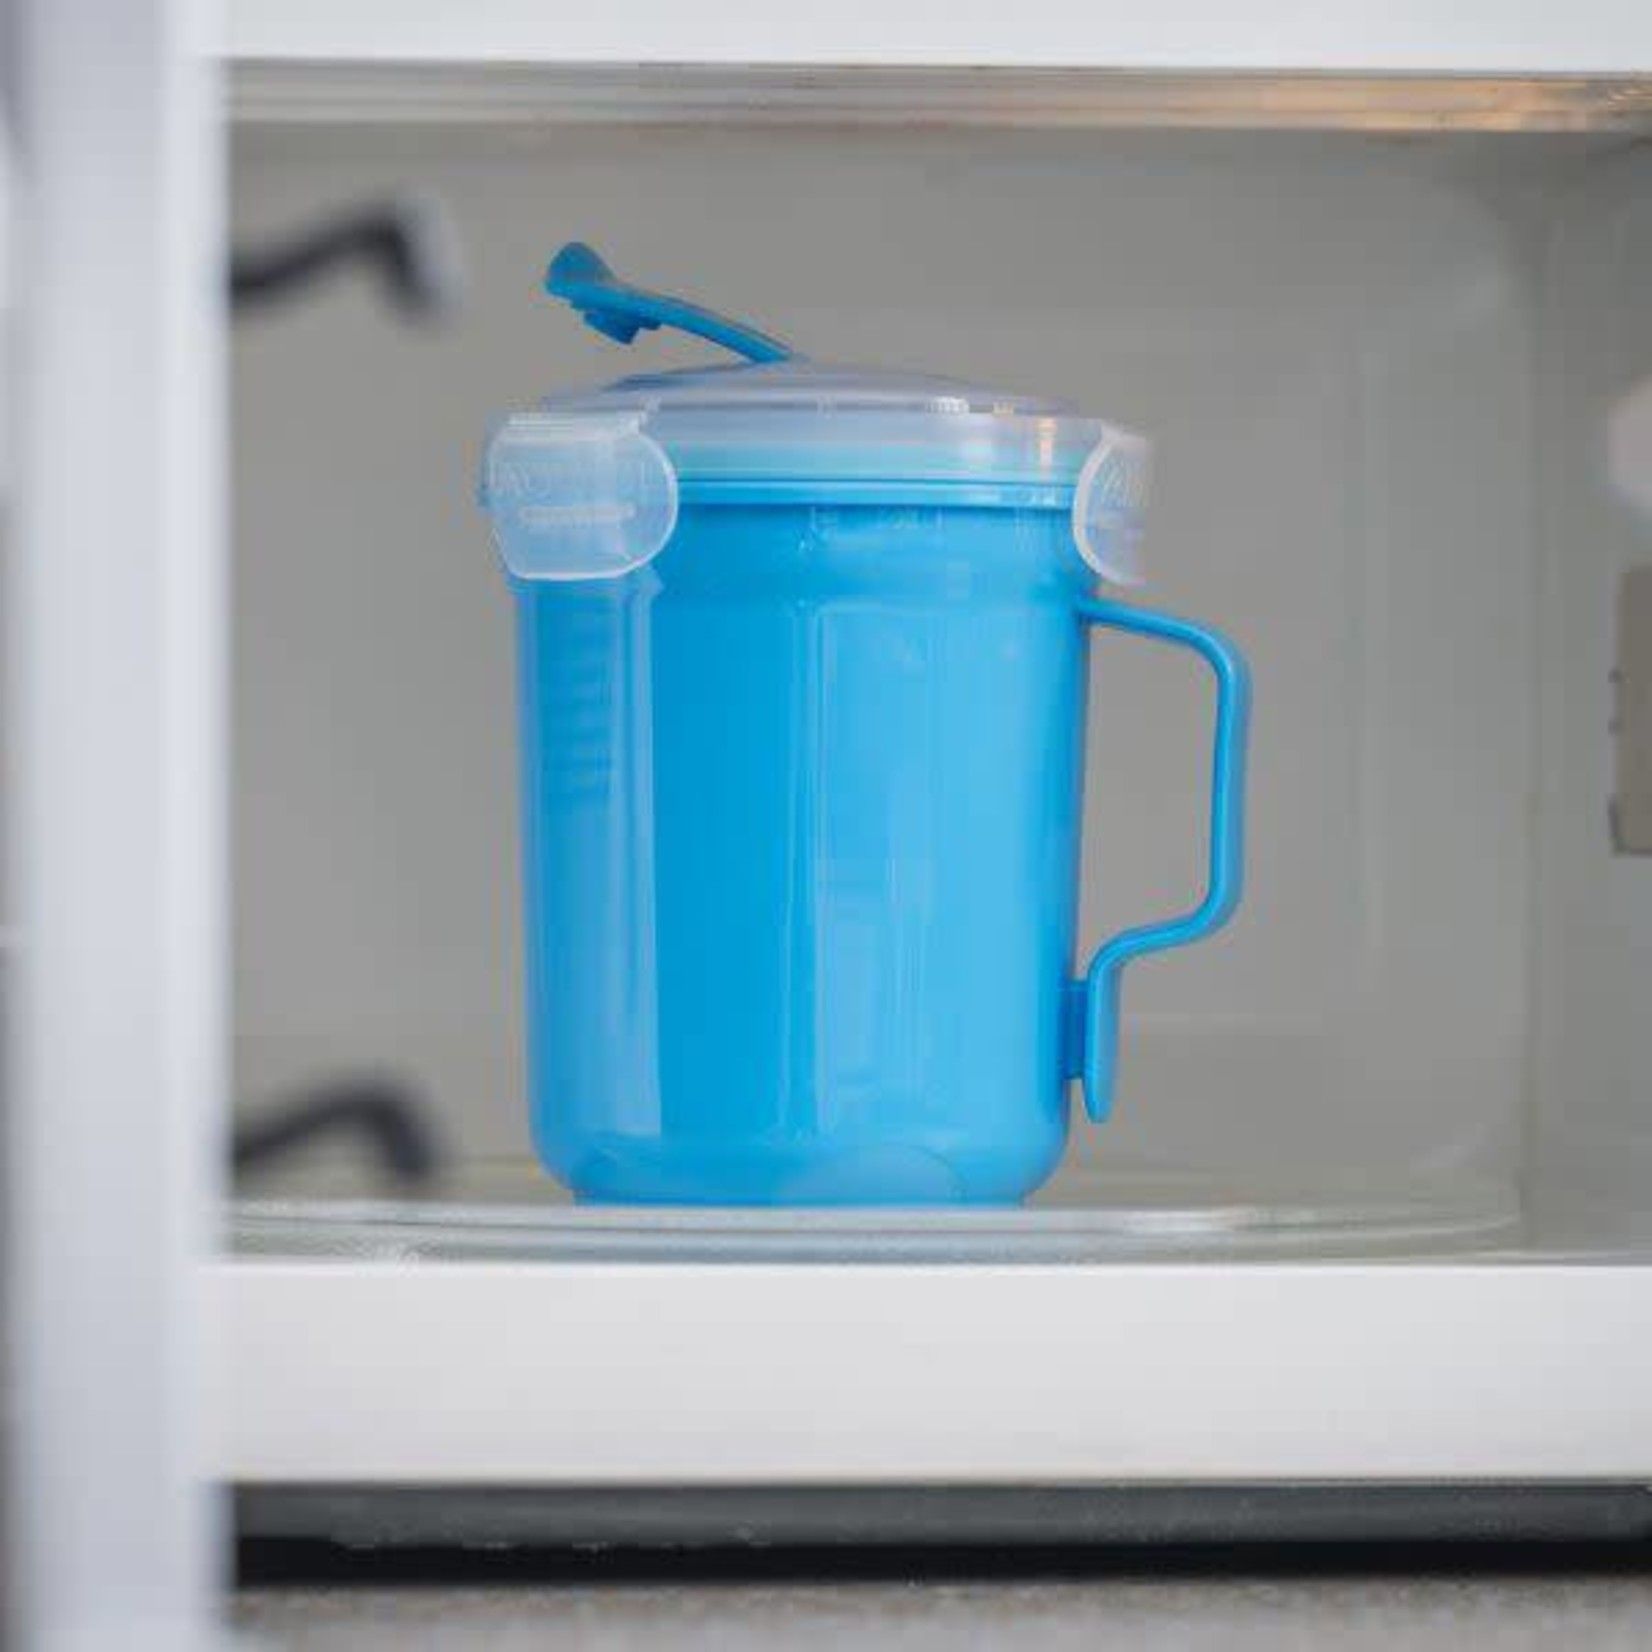 Addis ADDIS CLIP AND GO MICRO SOUP MUG - BLUE